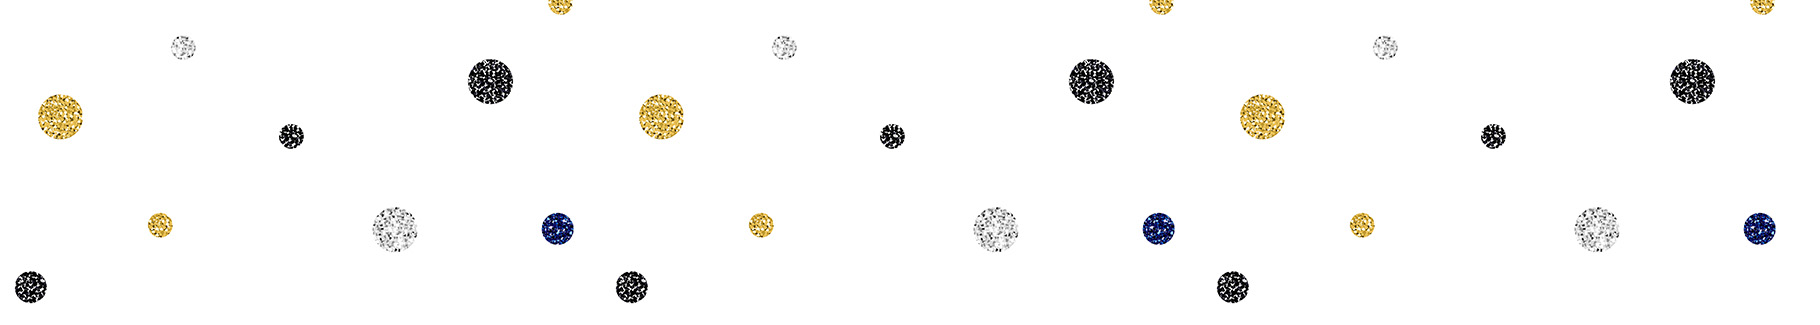 Naklejka diamentowe kropki